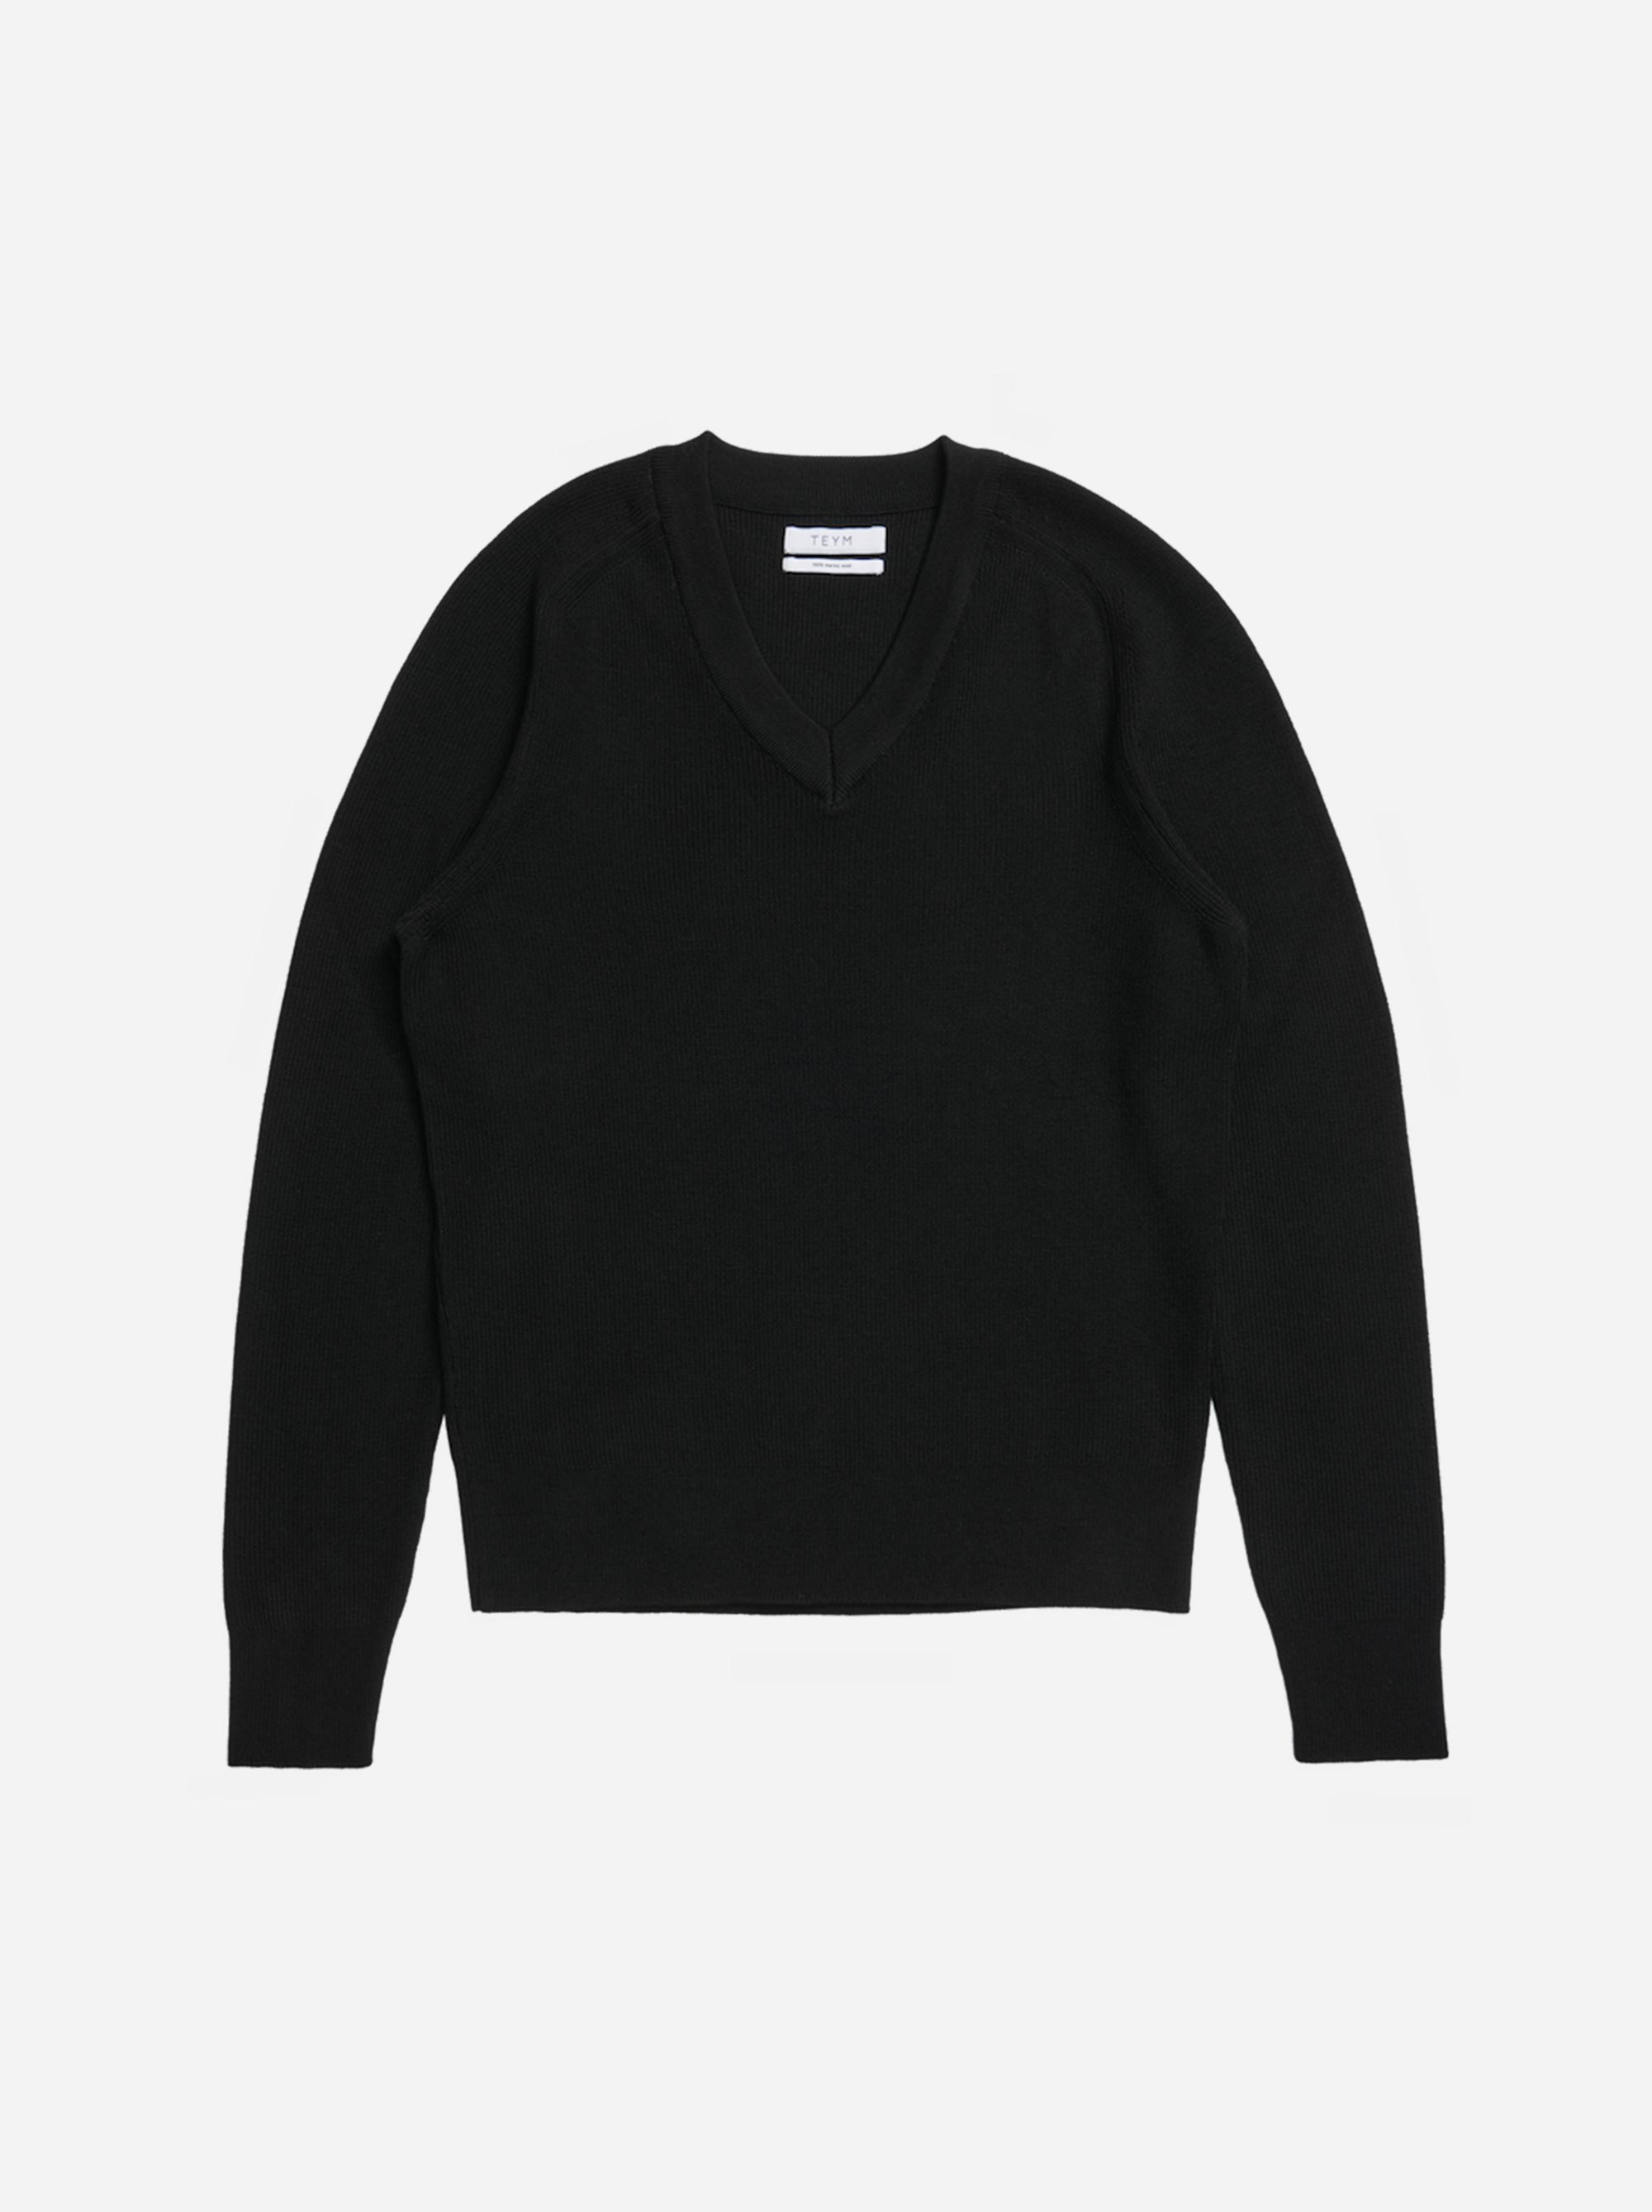 Teym - V-Neck - The Merino Sweater - Women - Black - 3